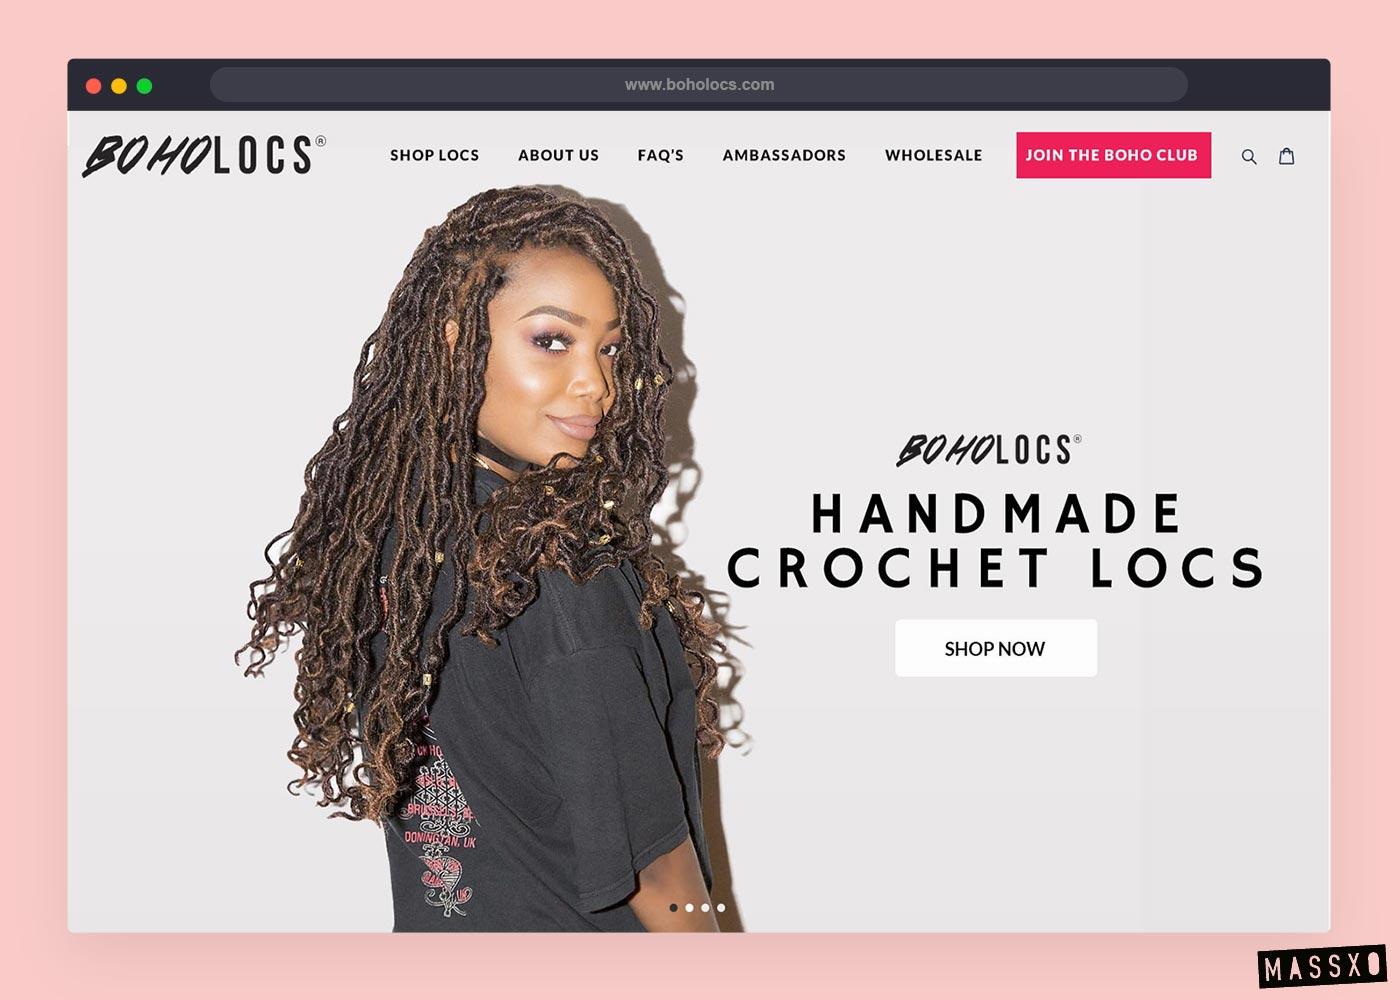 boholocs website design alternate splash version